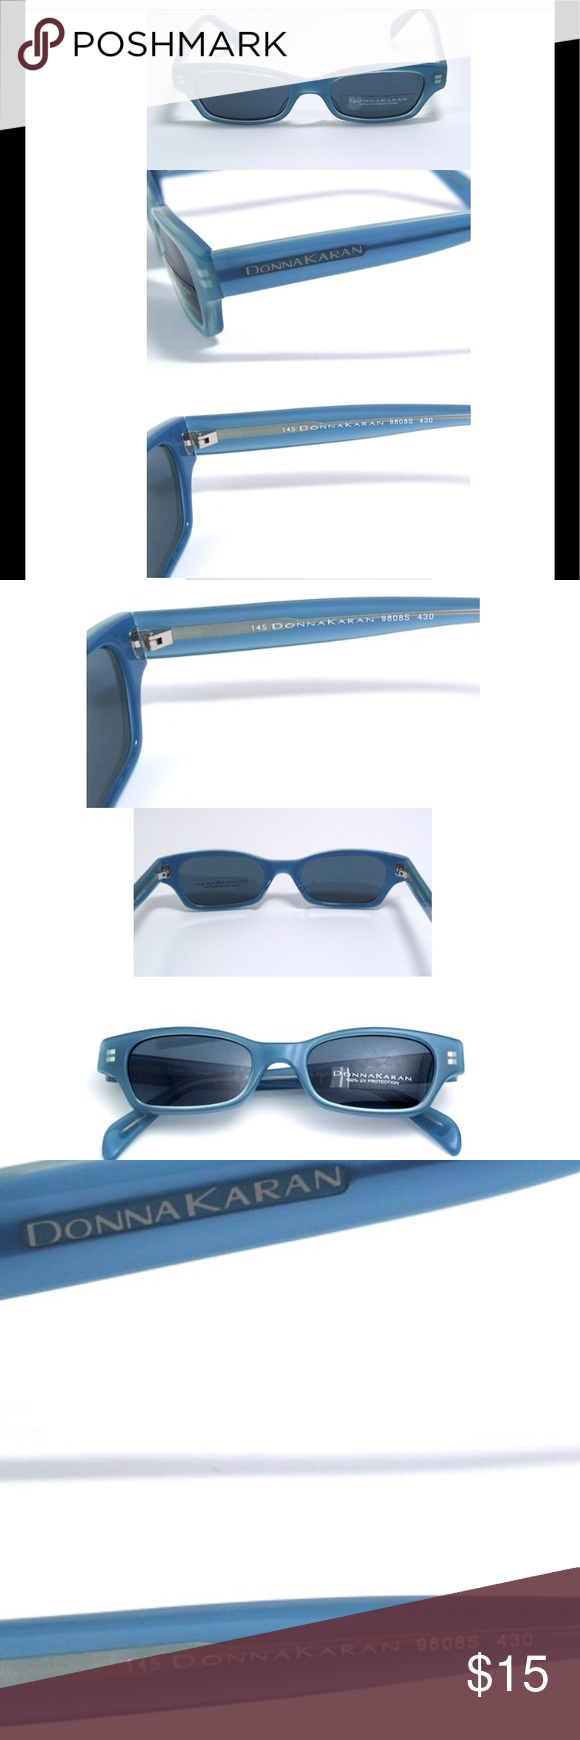 f28a97537a52 EUC Donna Karan Sunglasses 9808S-430 EUC Donna Karan Sunglasses 9808S-430.  No scratches on lenses or frame. Color  gray dark periwinkle Made in Japan  Eye 48 ...